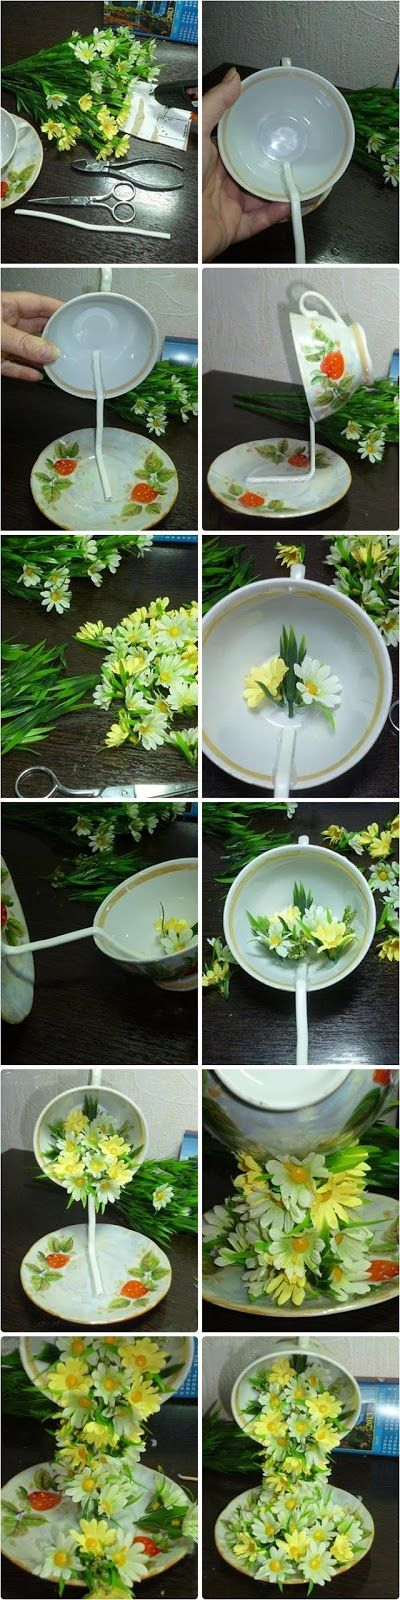 diy-flower-cups-flying-illusion-tutorial-step-by-step.jpg (400×1600)